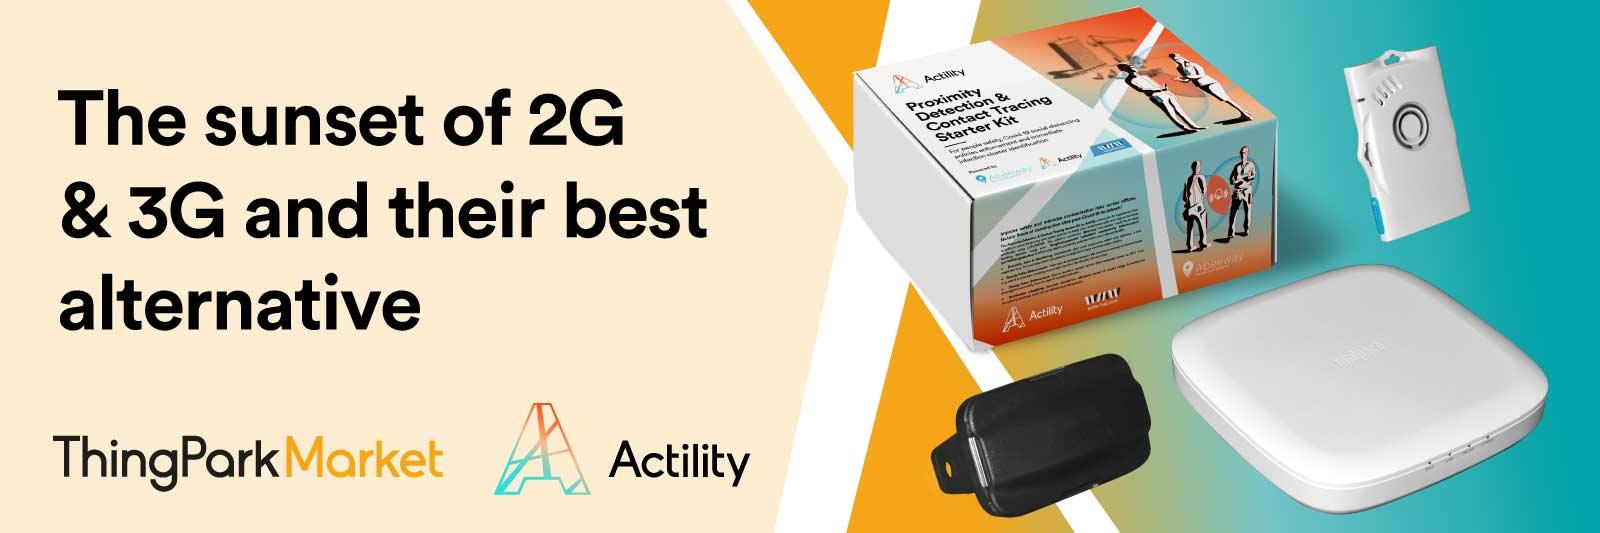 The 2G shutdown & 3G sunset and their best alternatives